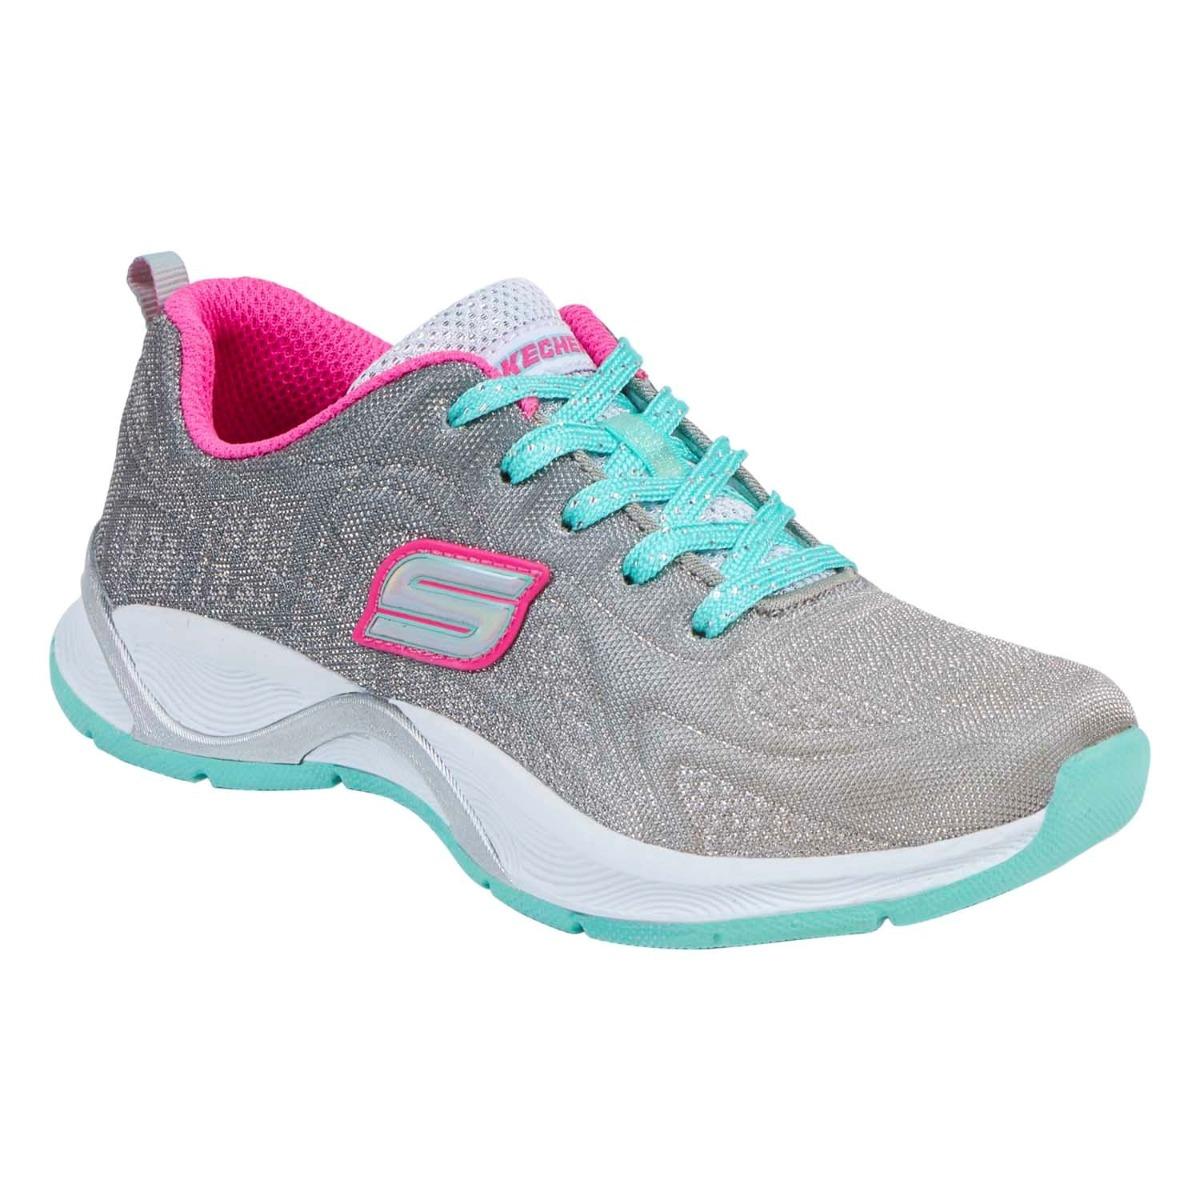 e16f490a48e tenis skechers para niña rosa aqua gris. Cargando zoom.